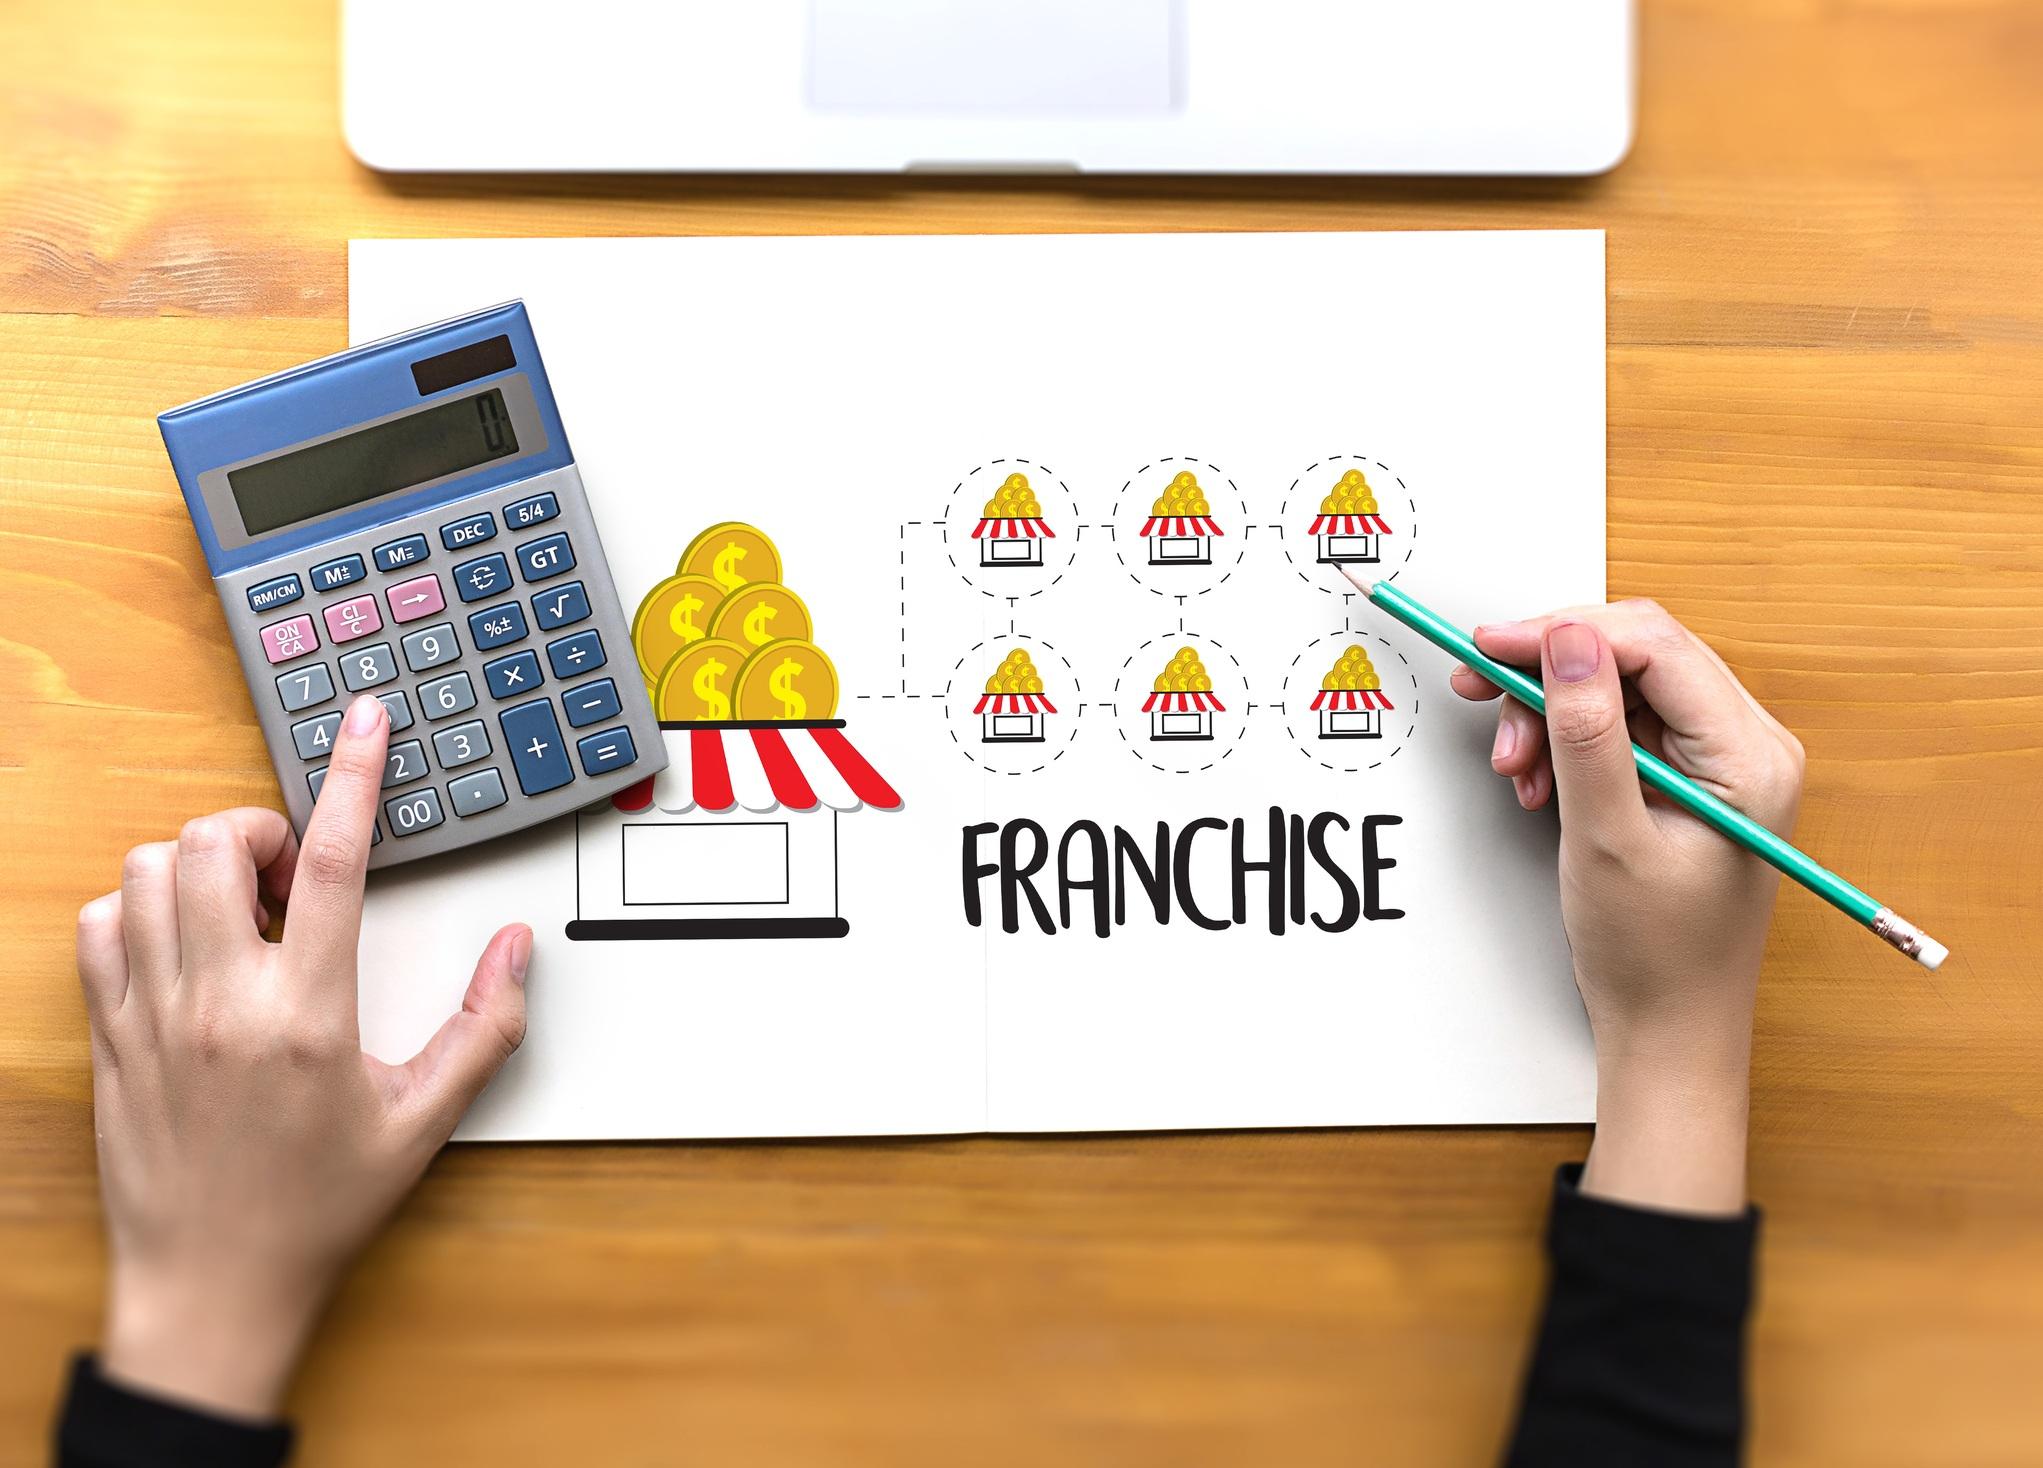 Franchise, franchiserecht, prognose, franchisenemer, franchisegever, franchiseformule, franchiseovereenkomst, non-concurrentiebeding, rayon, acquisitiefraude